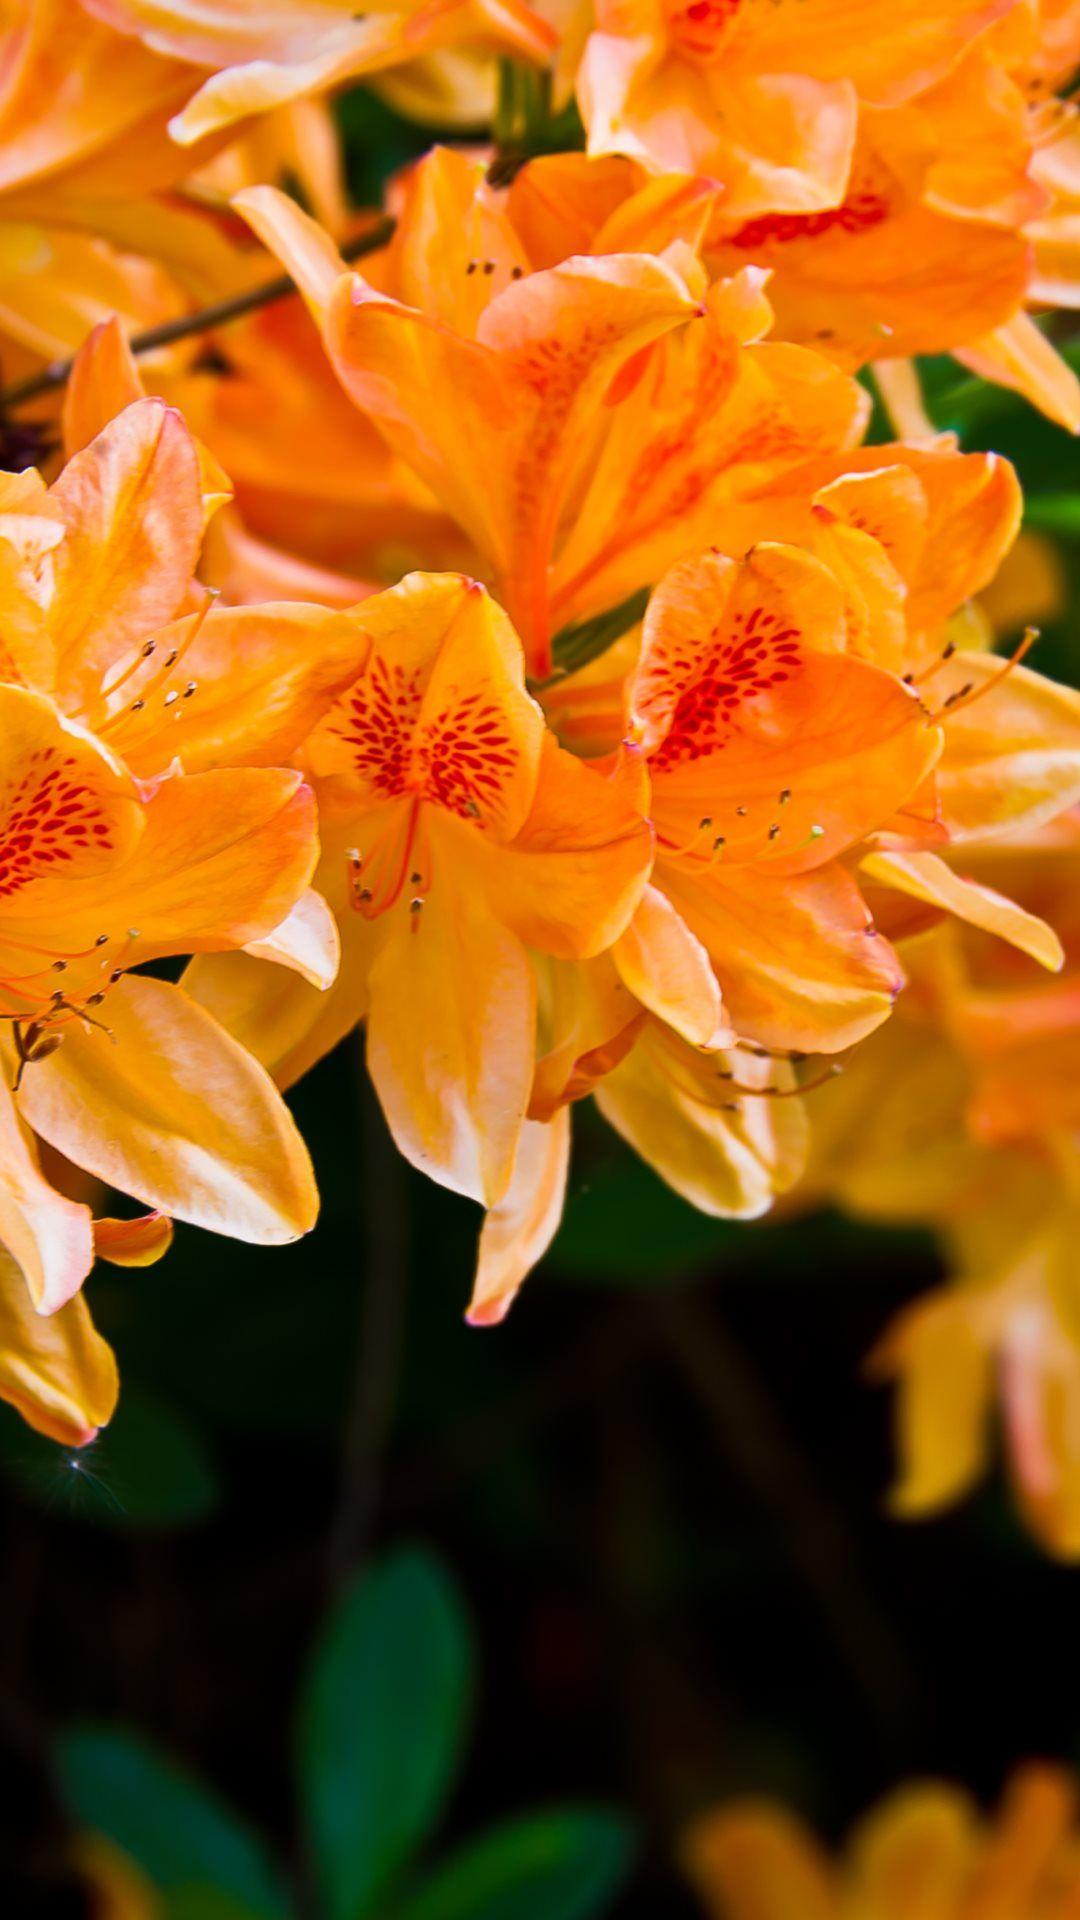 Light Orange Flowers Iphone 6 Plus Wallpaper Orange Wallpaper Flower Iphone Wallpaper Flower Wallpaper